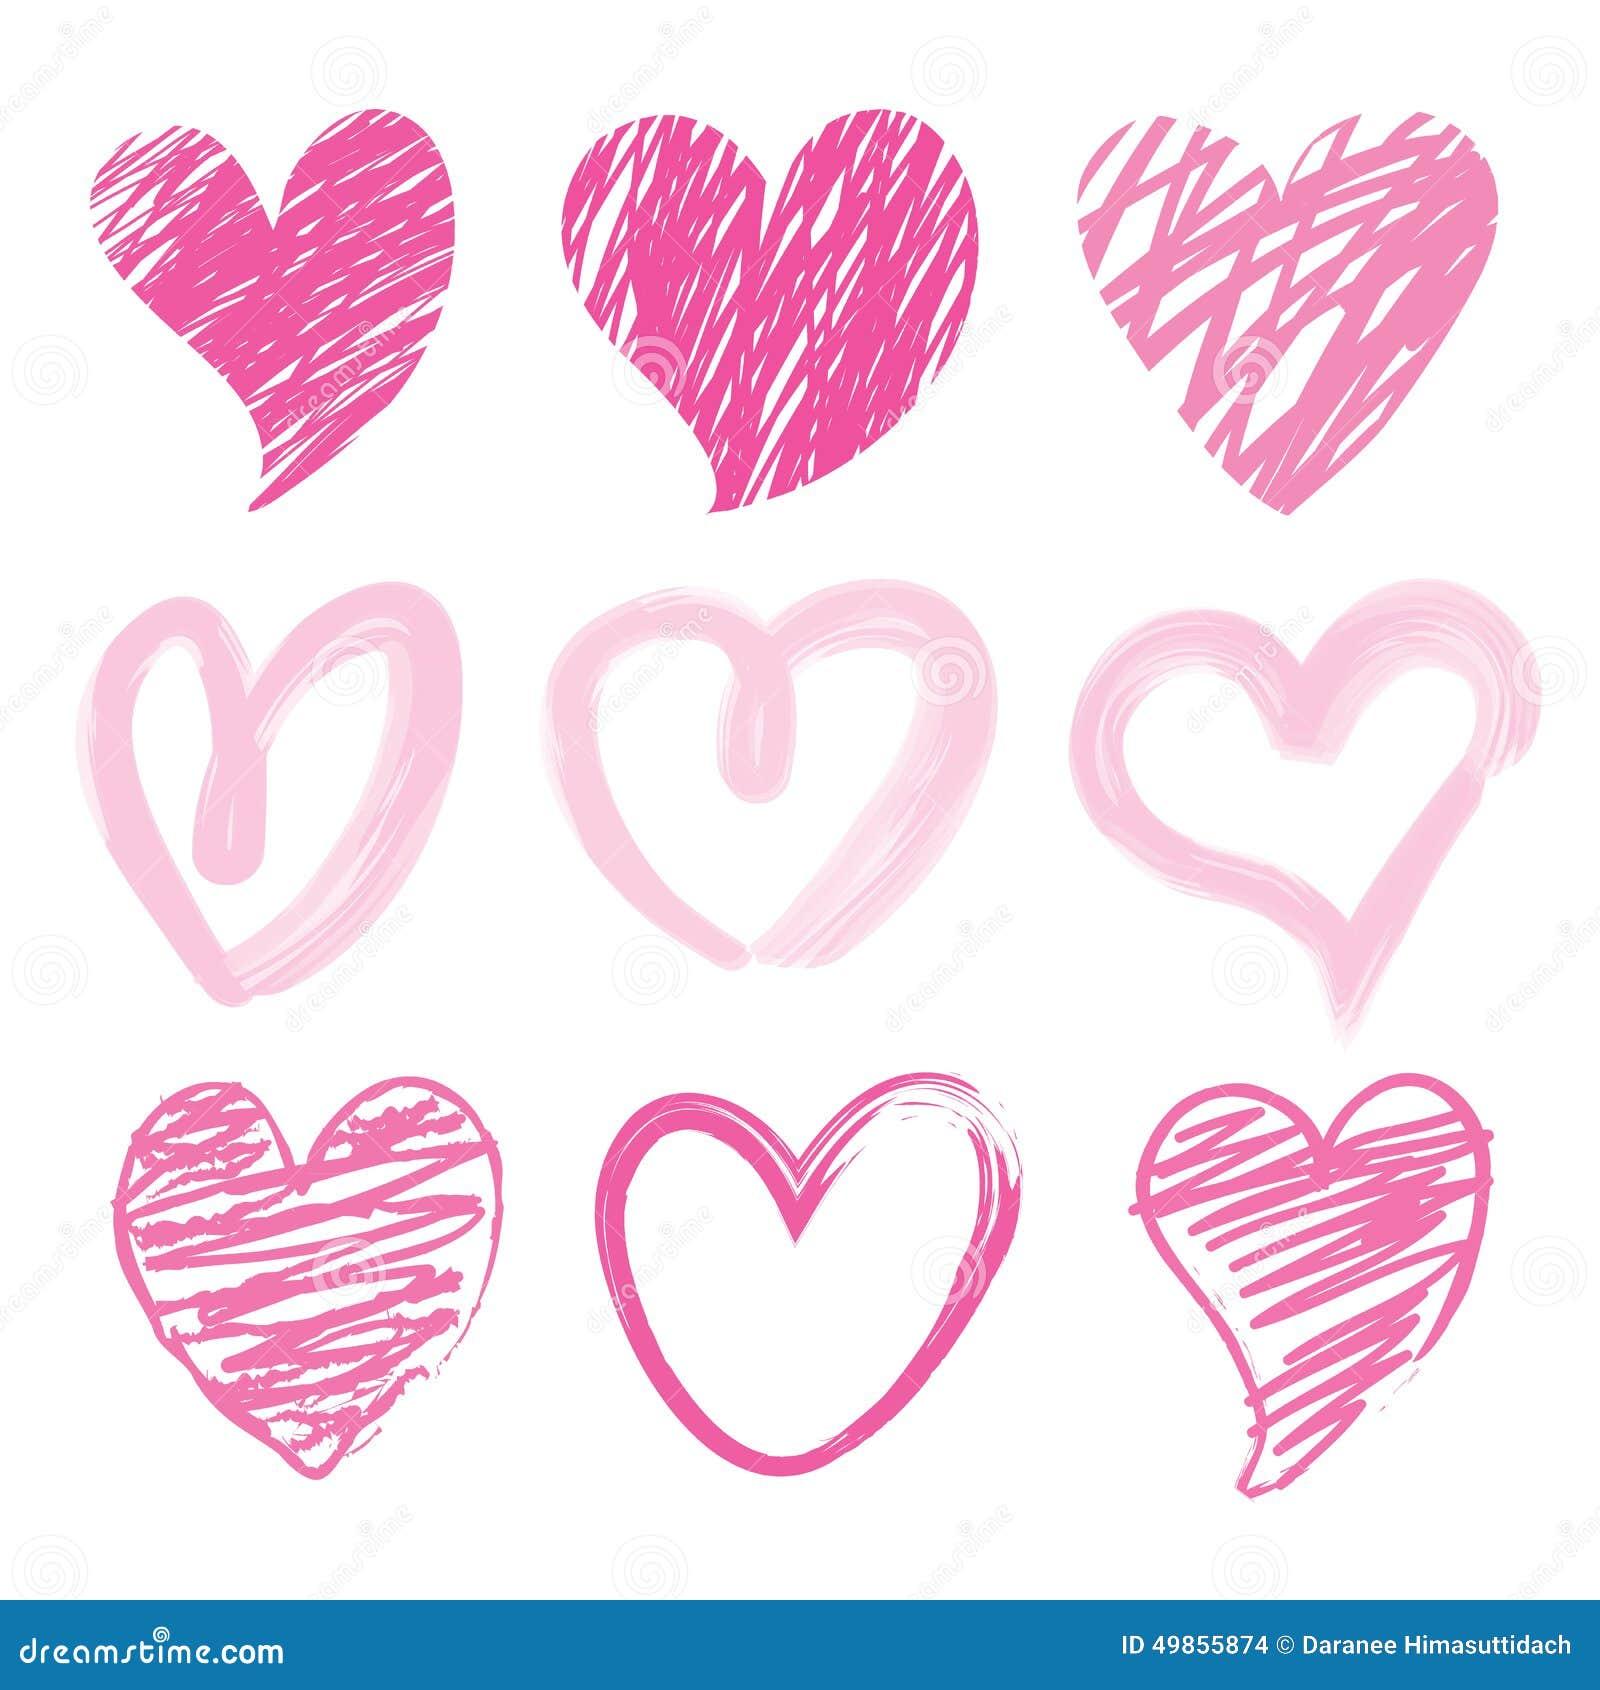 Sweetheart I Love You Valentine Heart Brush Cute Cartoon Design Vector